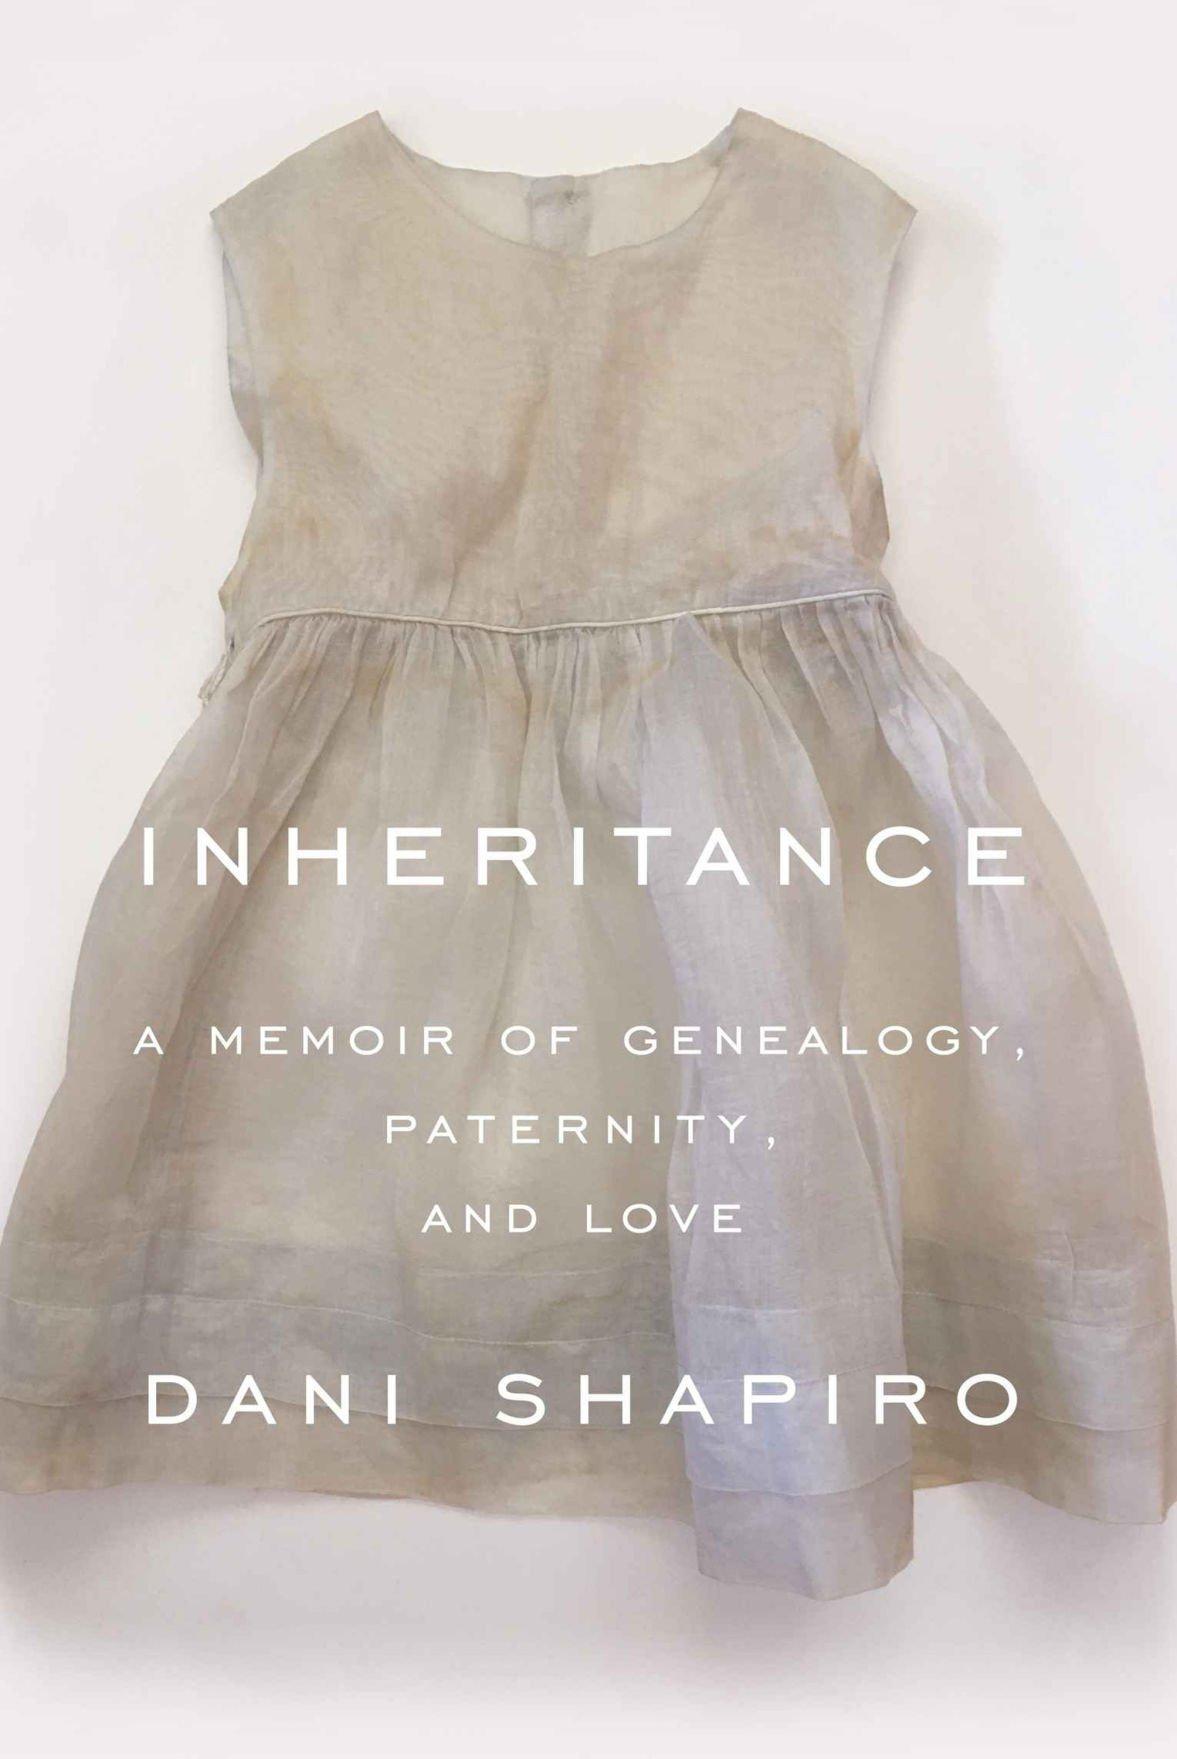 """Inheritance: A Memoir of Genealogy, Paternity, and Love"" by Dani Shapiro"